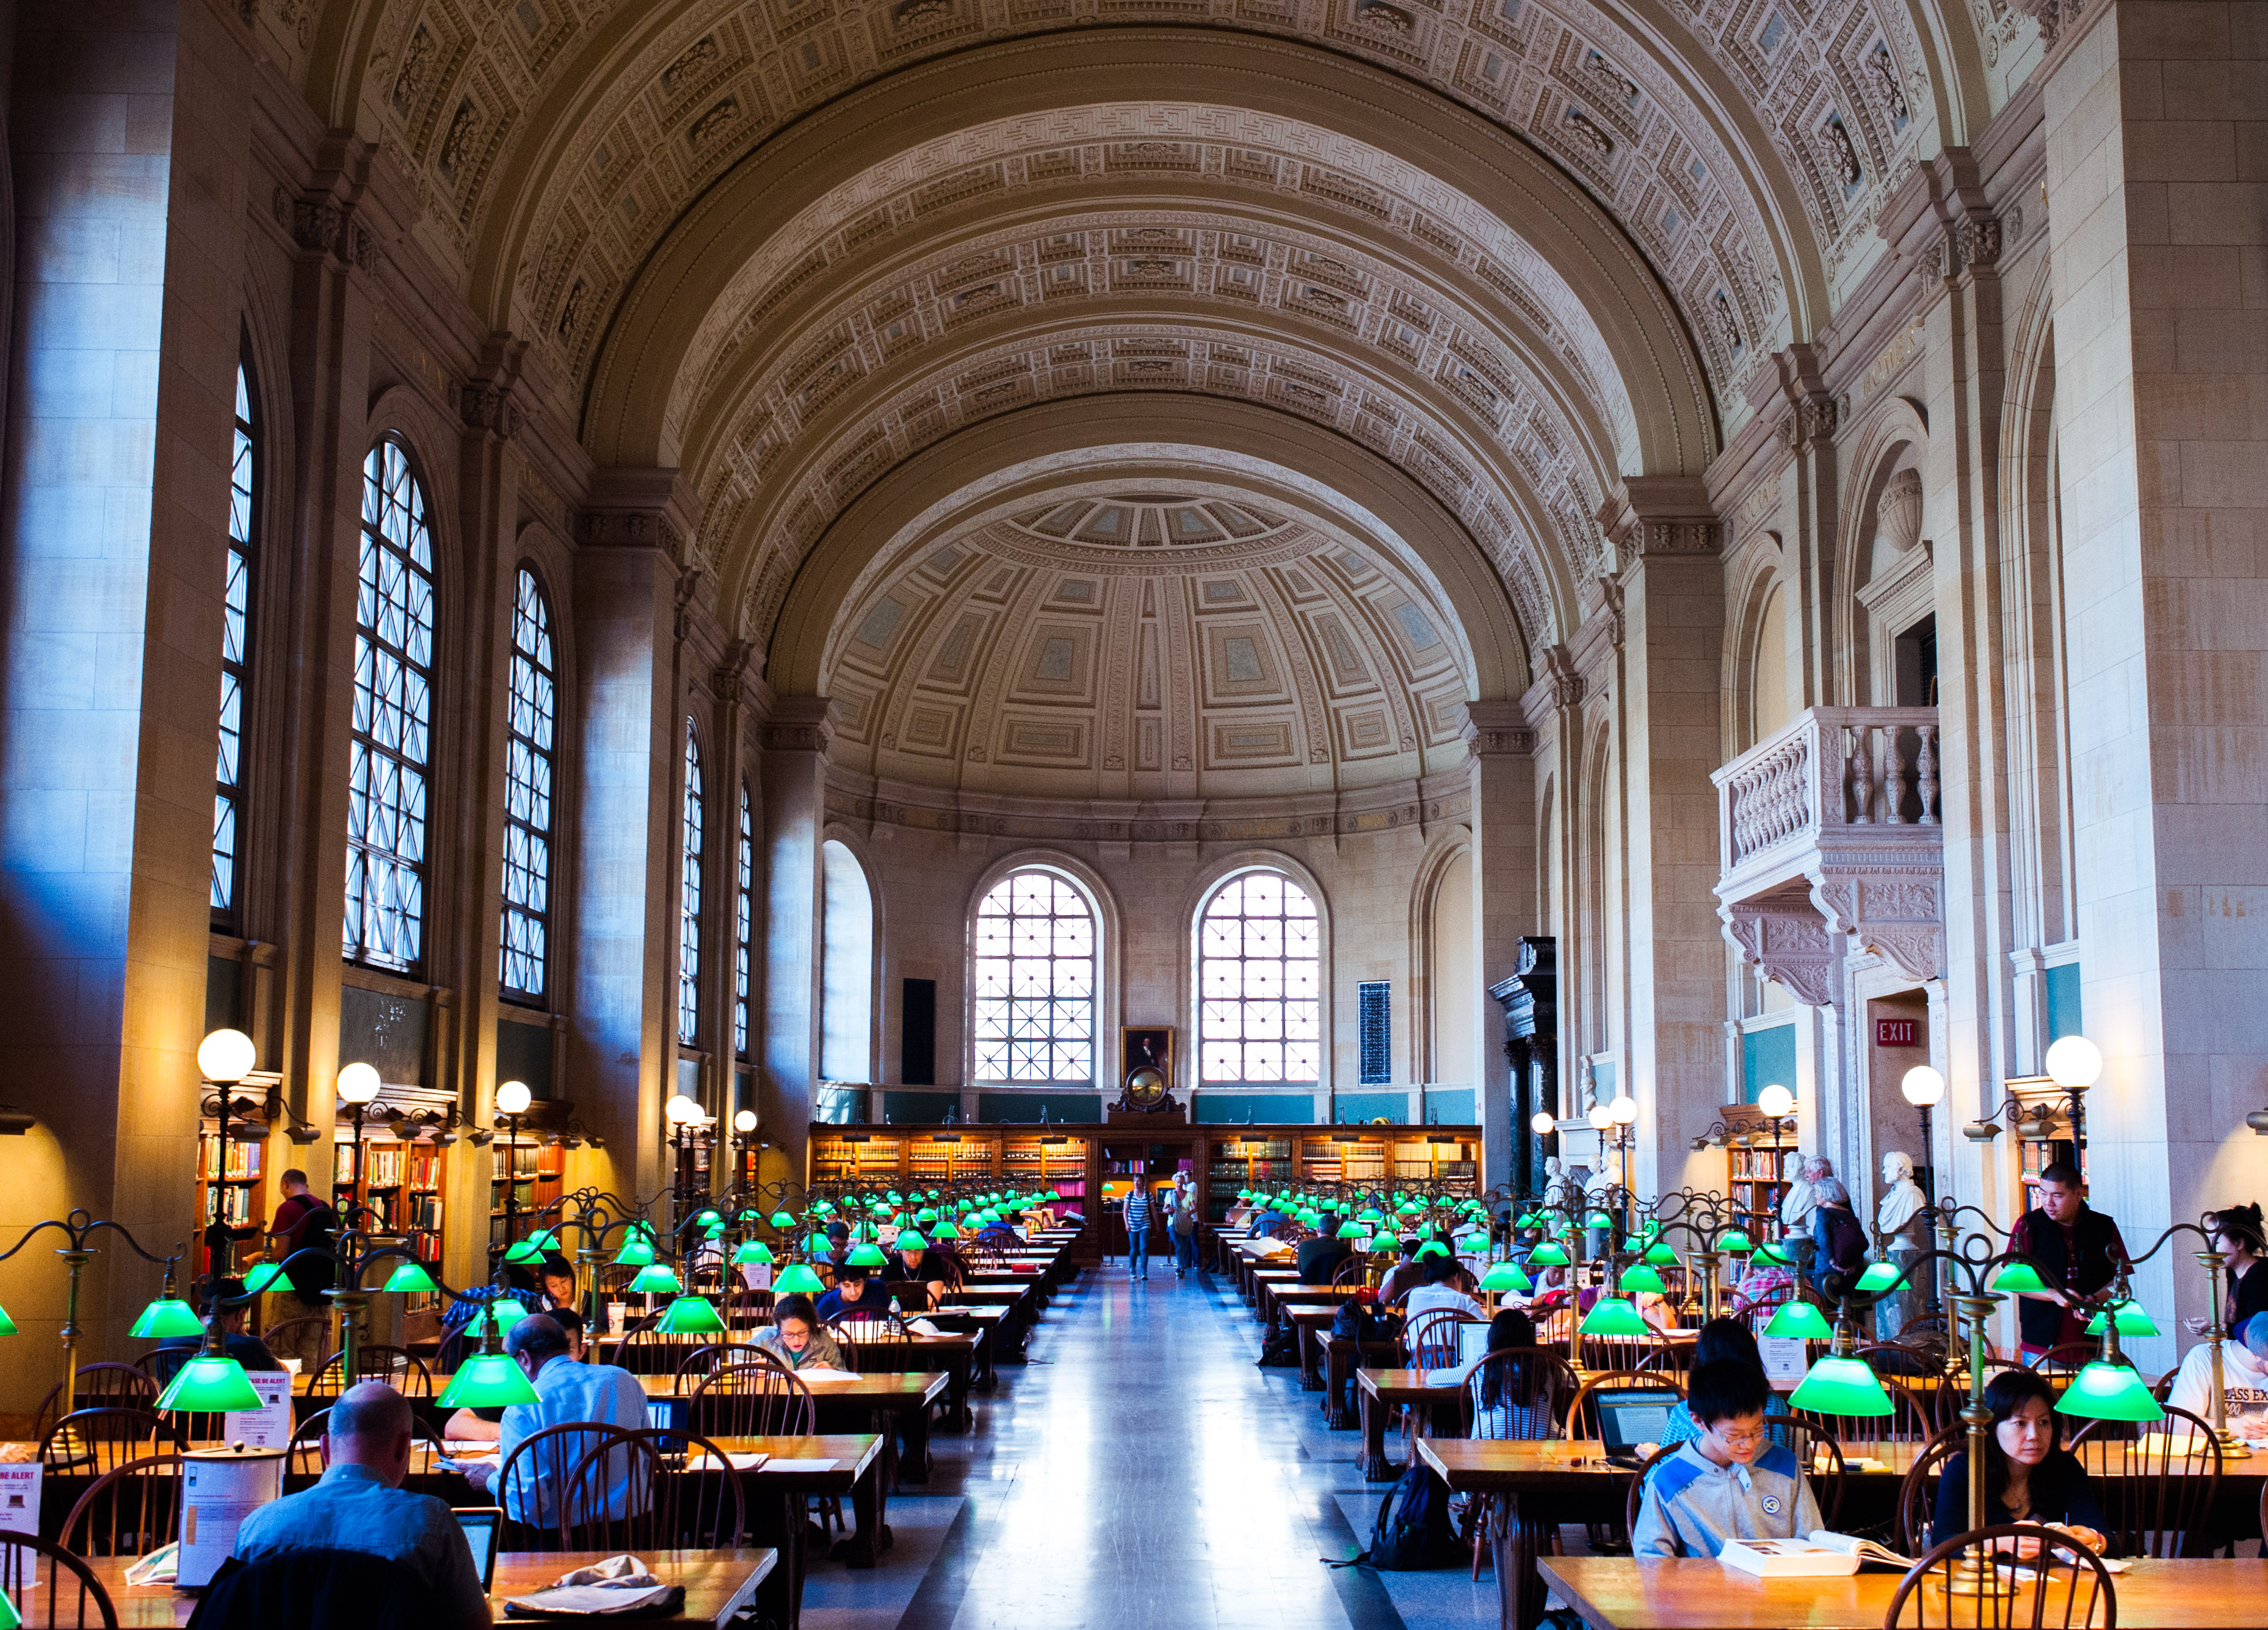 Boston Public Library v Bostonu.